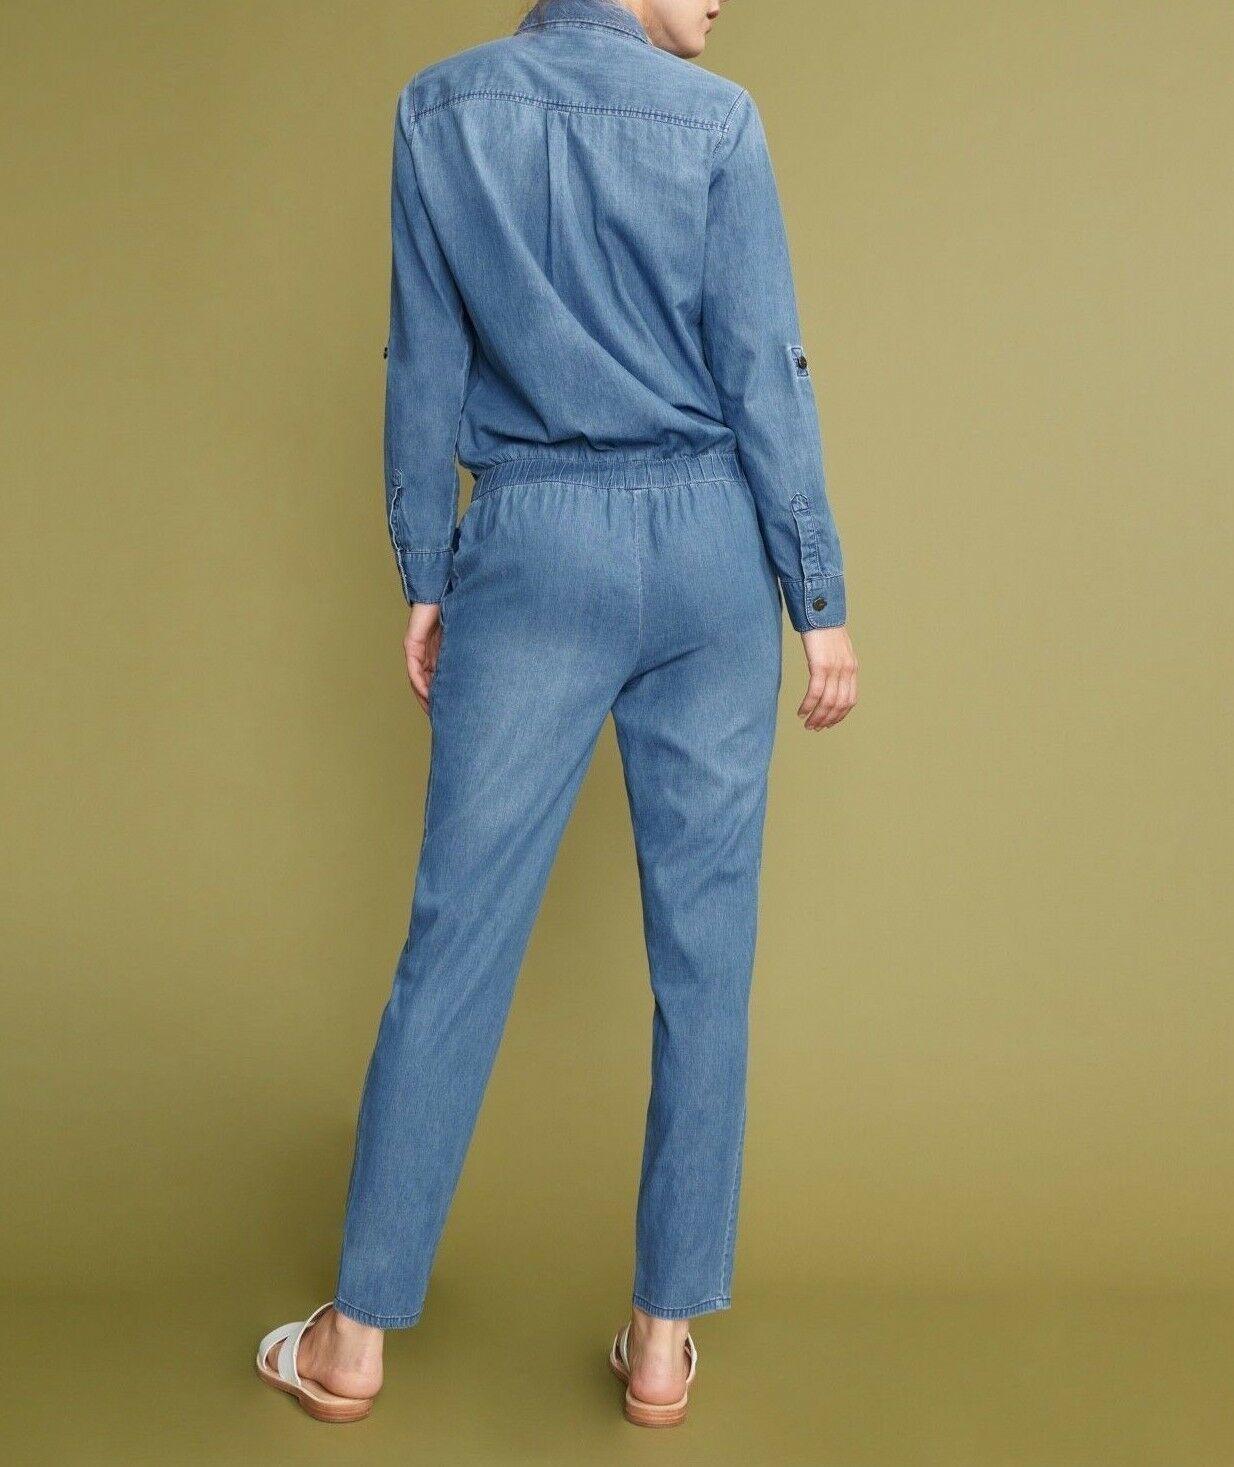 Anthropologie Laureen Denim Jumpsuit by Reiko $230 Sx XS - NWT